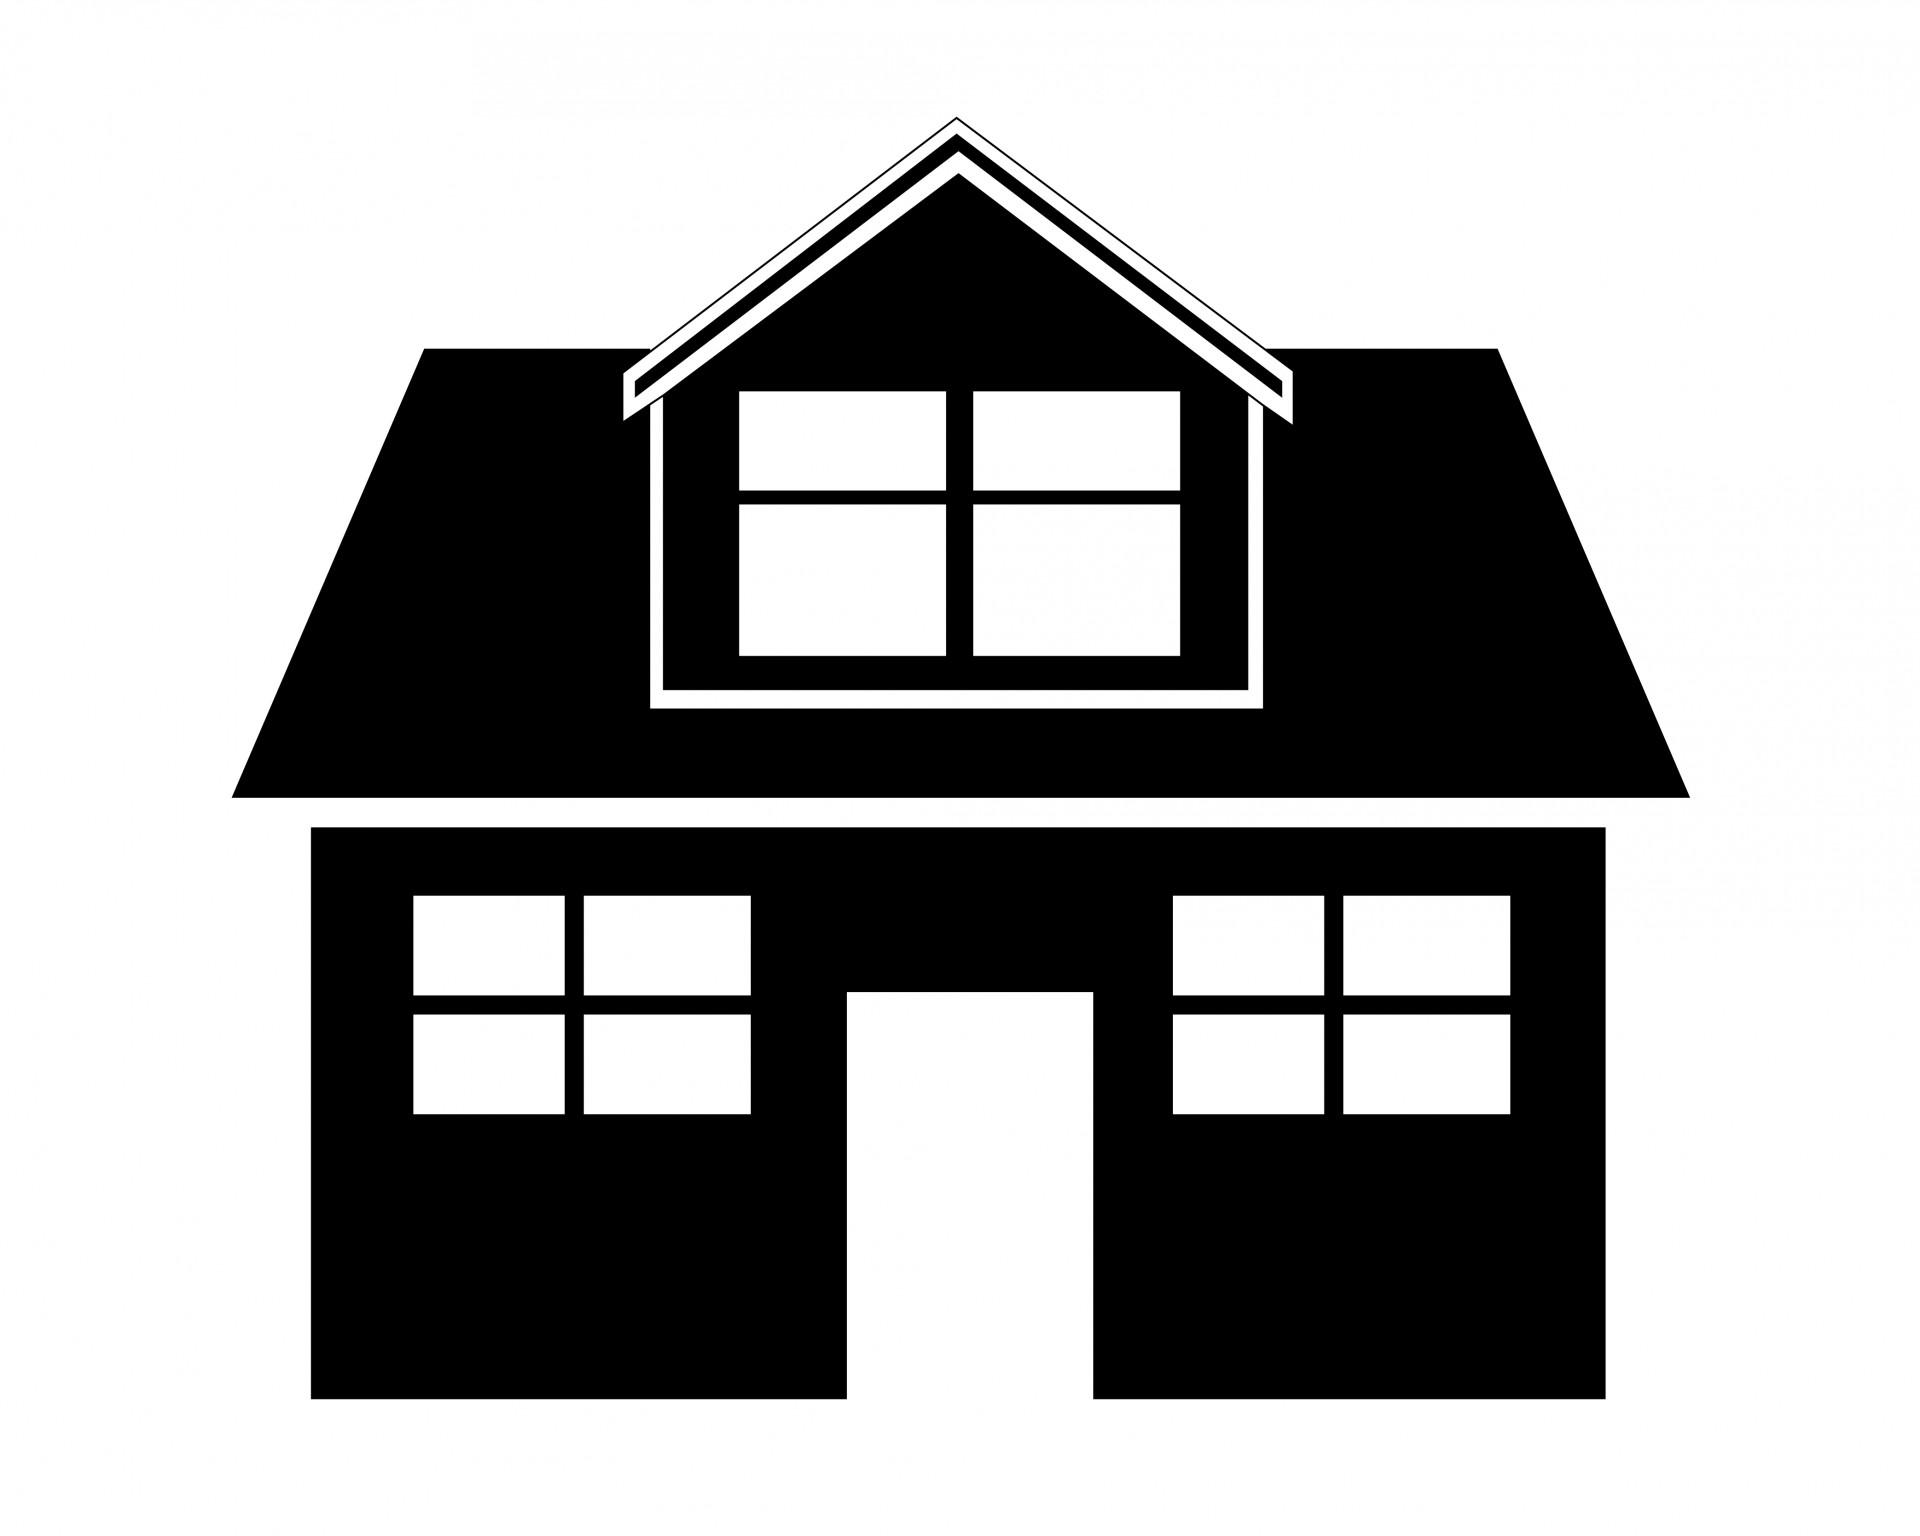 House Clipart-House Clipart-5